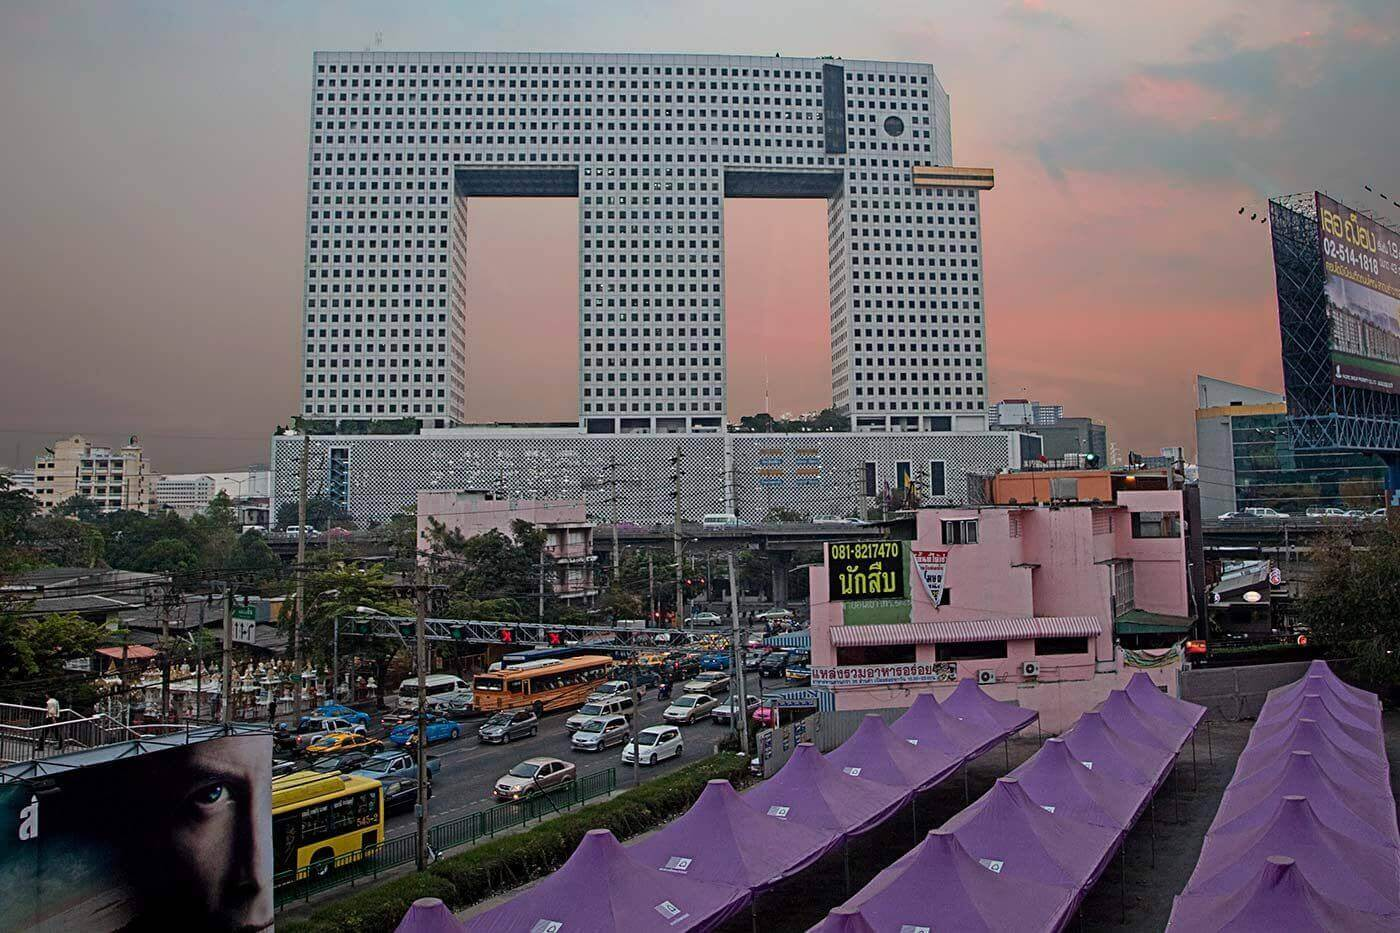 The Elephant Building